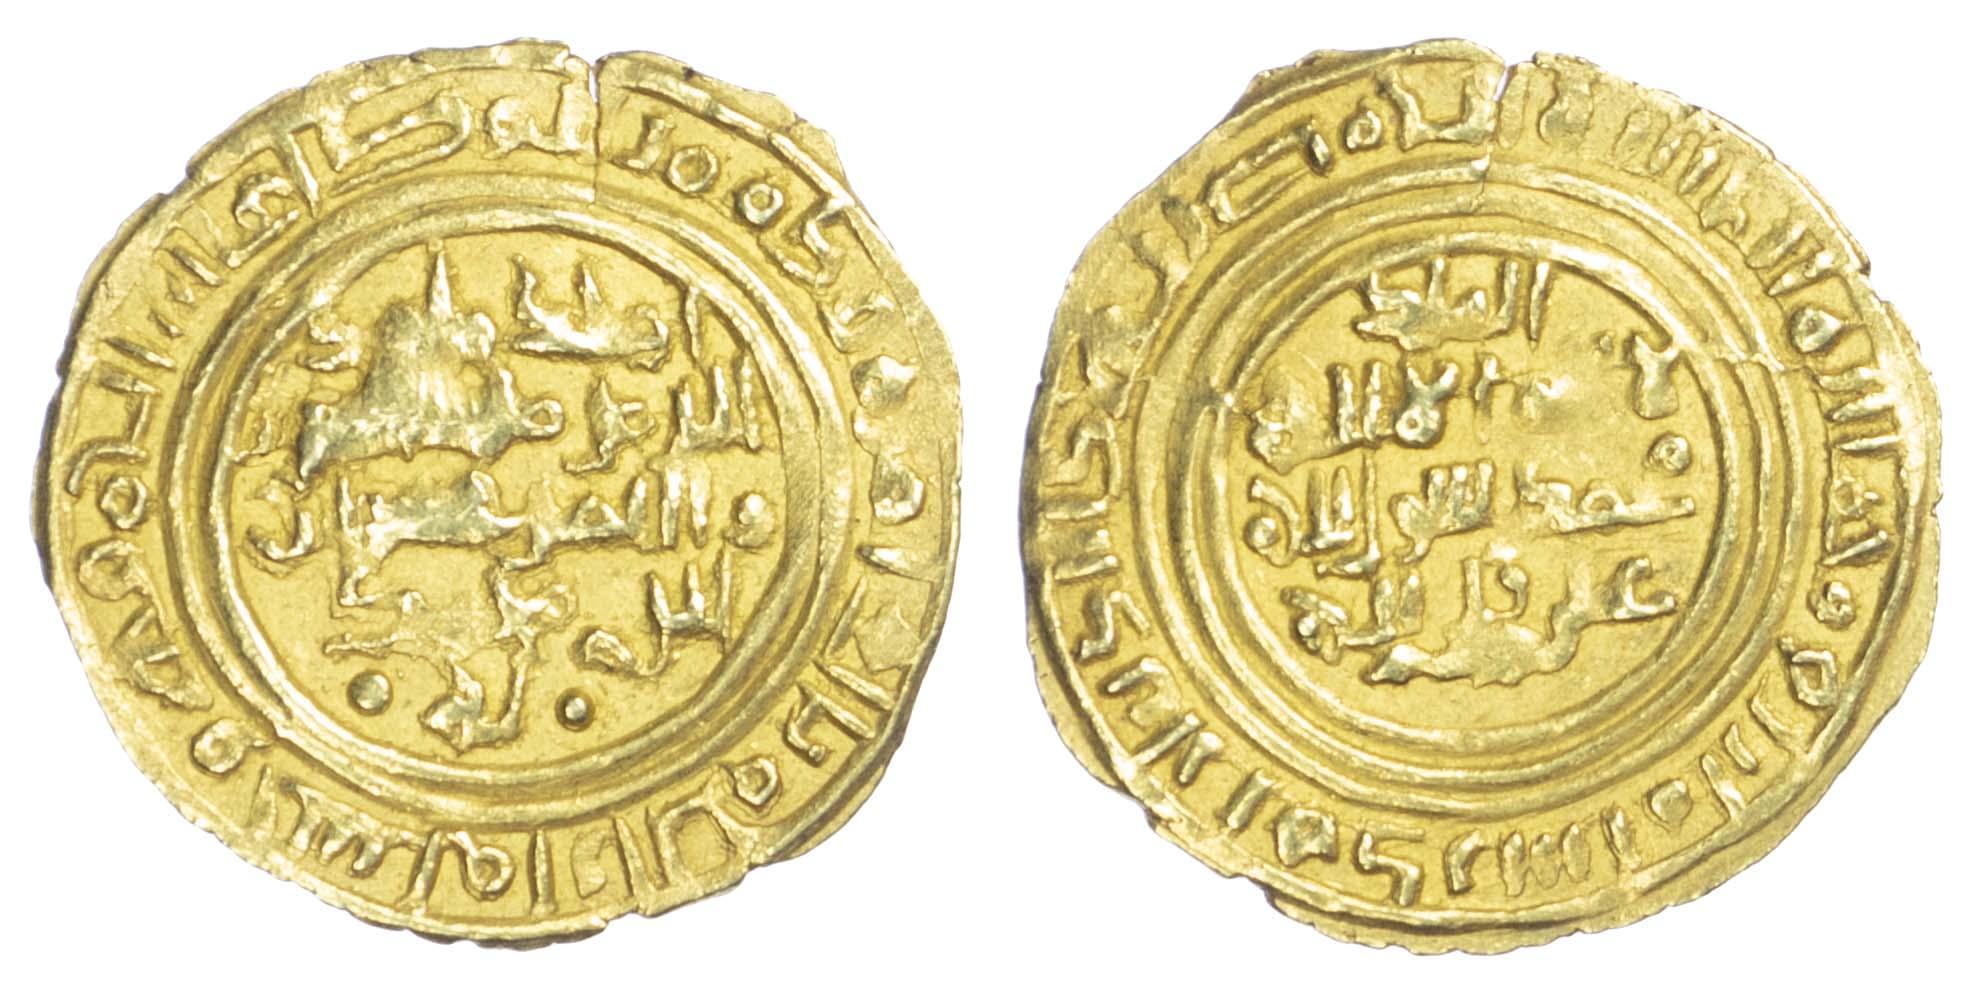 ZURAY'ID, IMRAN B. MUHAMMAD, POSTHUMOUS GOLD DINAR (564H/1169 AD) – VERY RARE